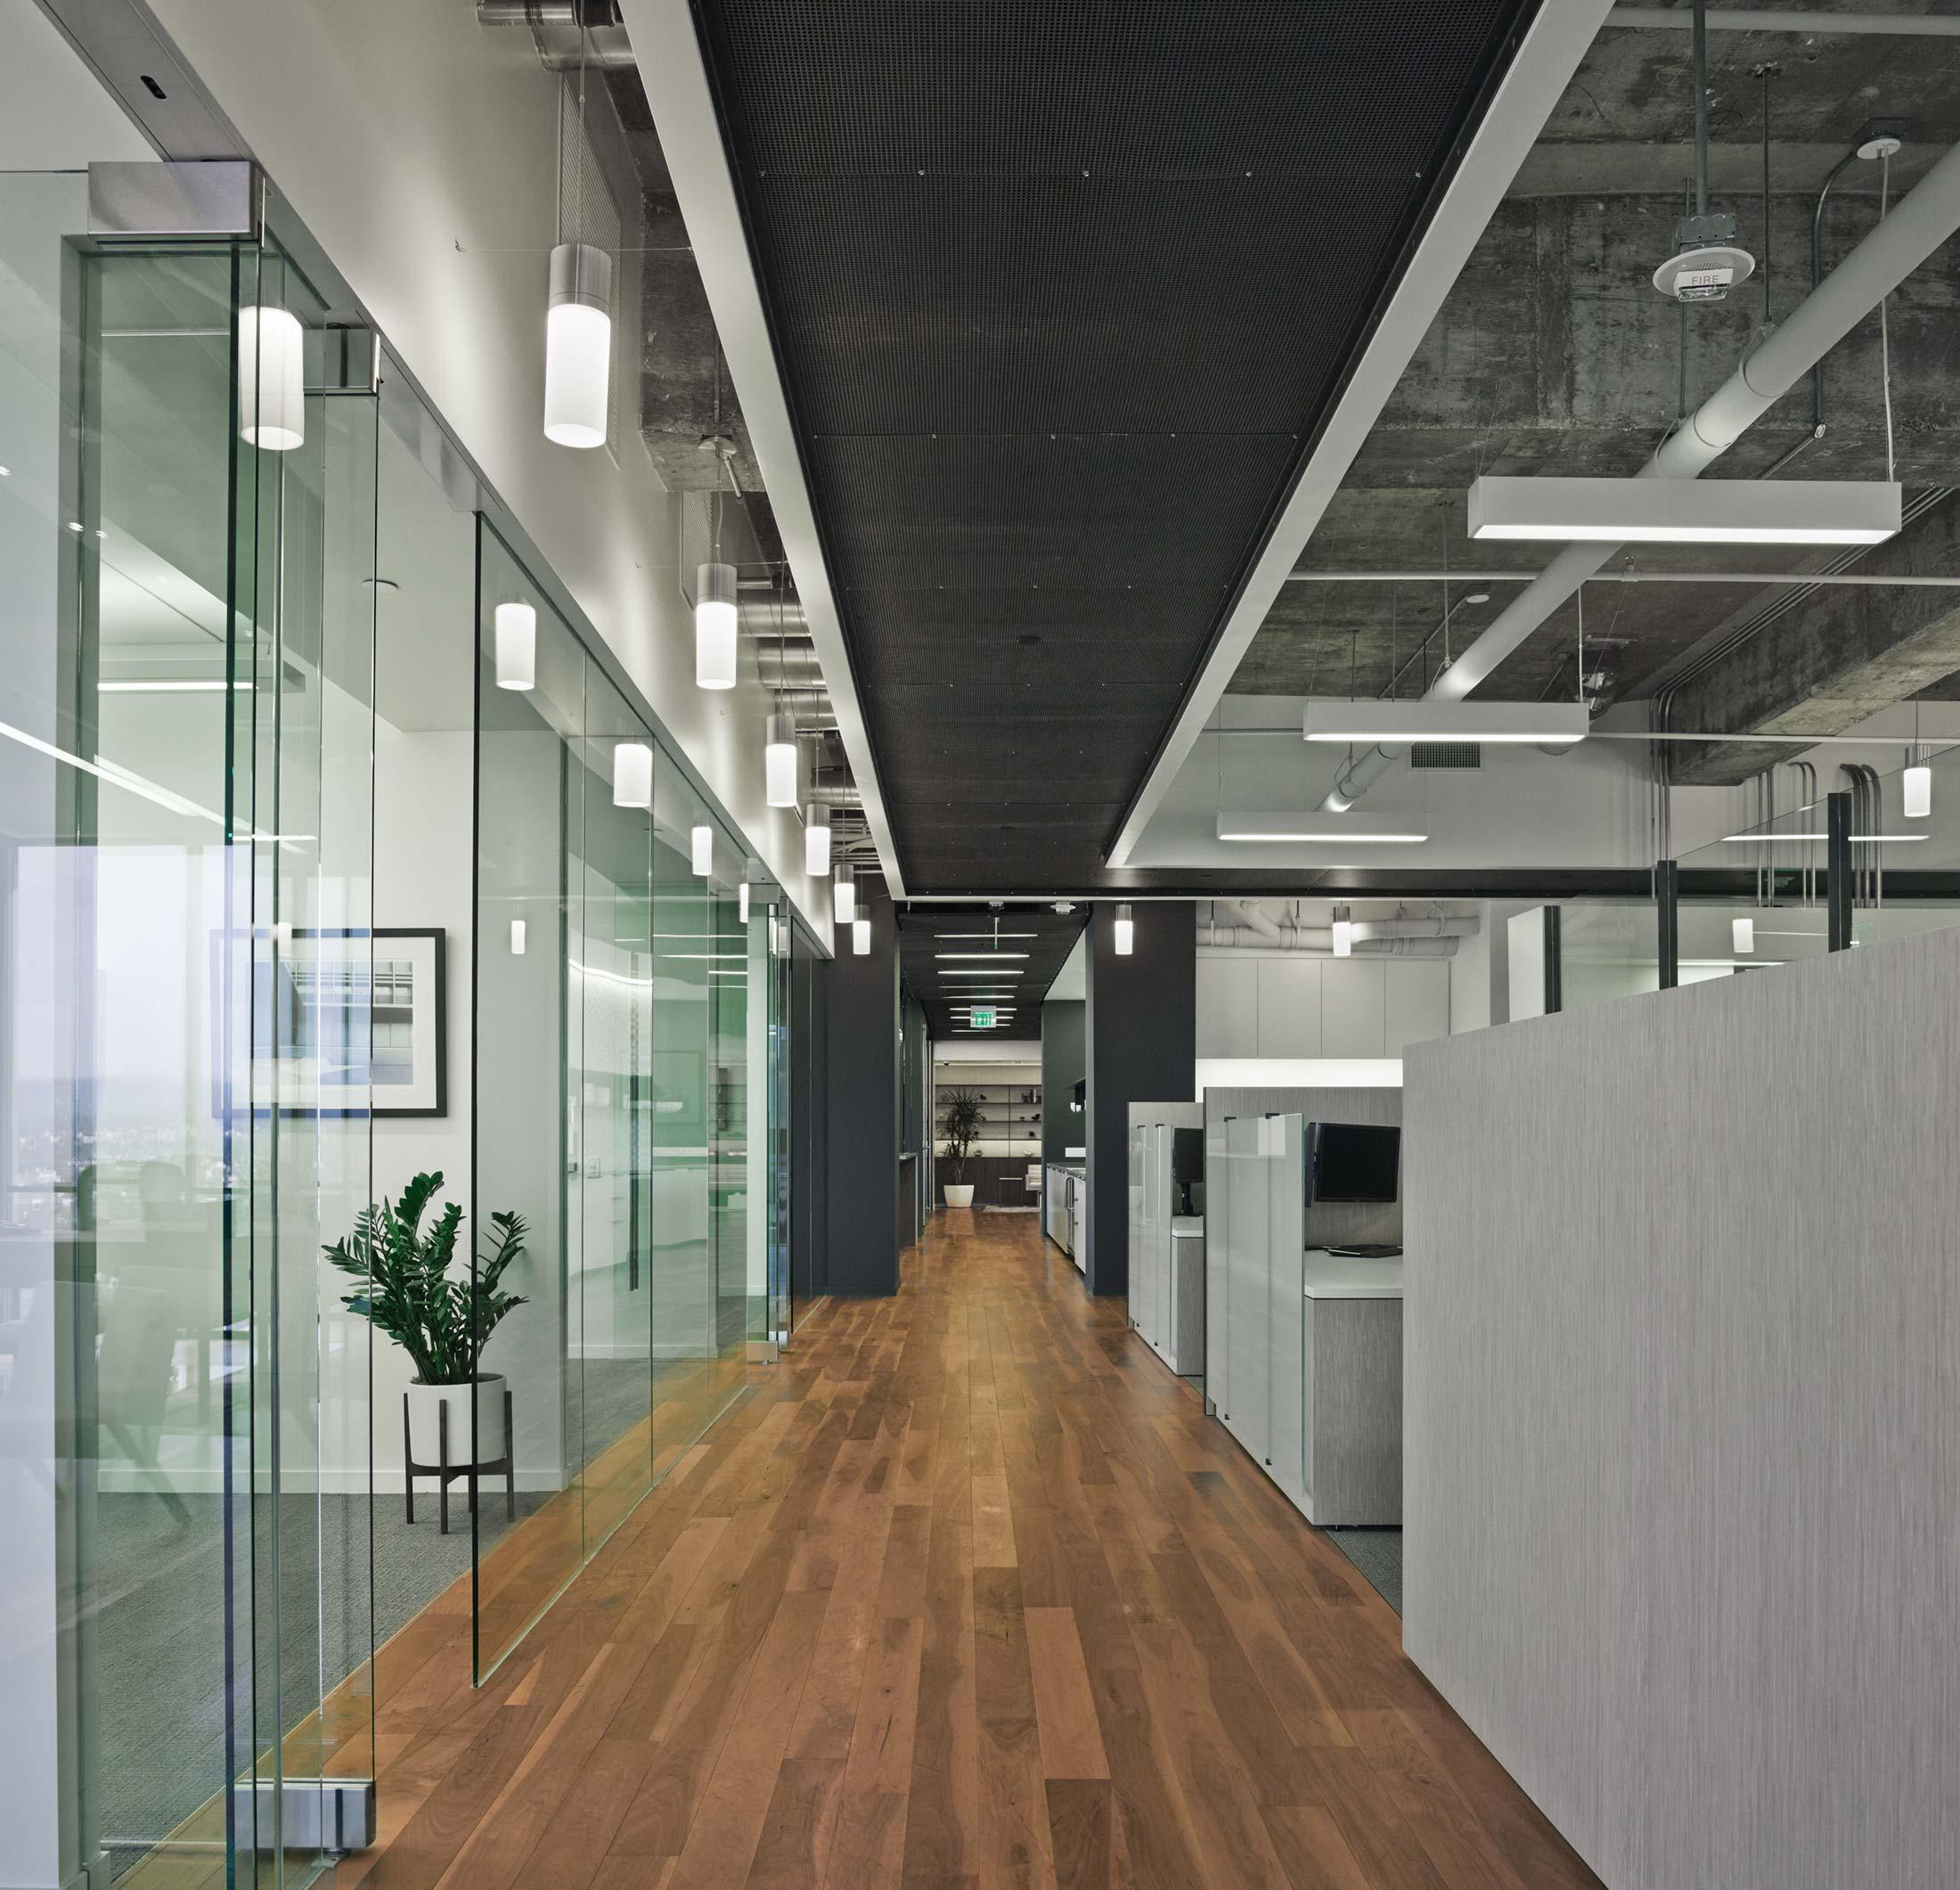 modern-architecture-commercial-interiors-workplace-office-custom-fabrication-california-shubindonaldson-freemark-financial-09